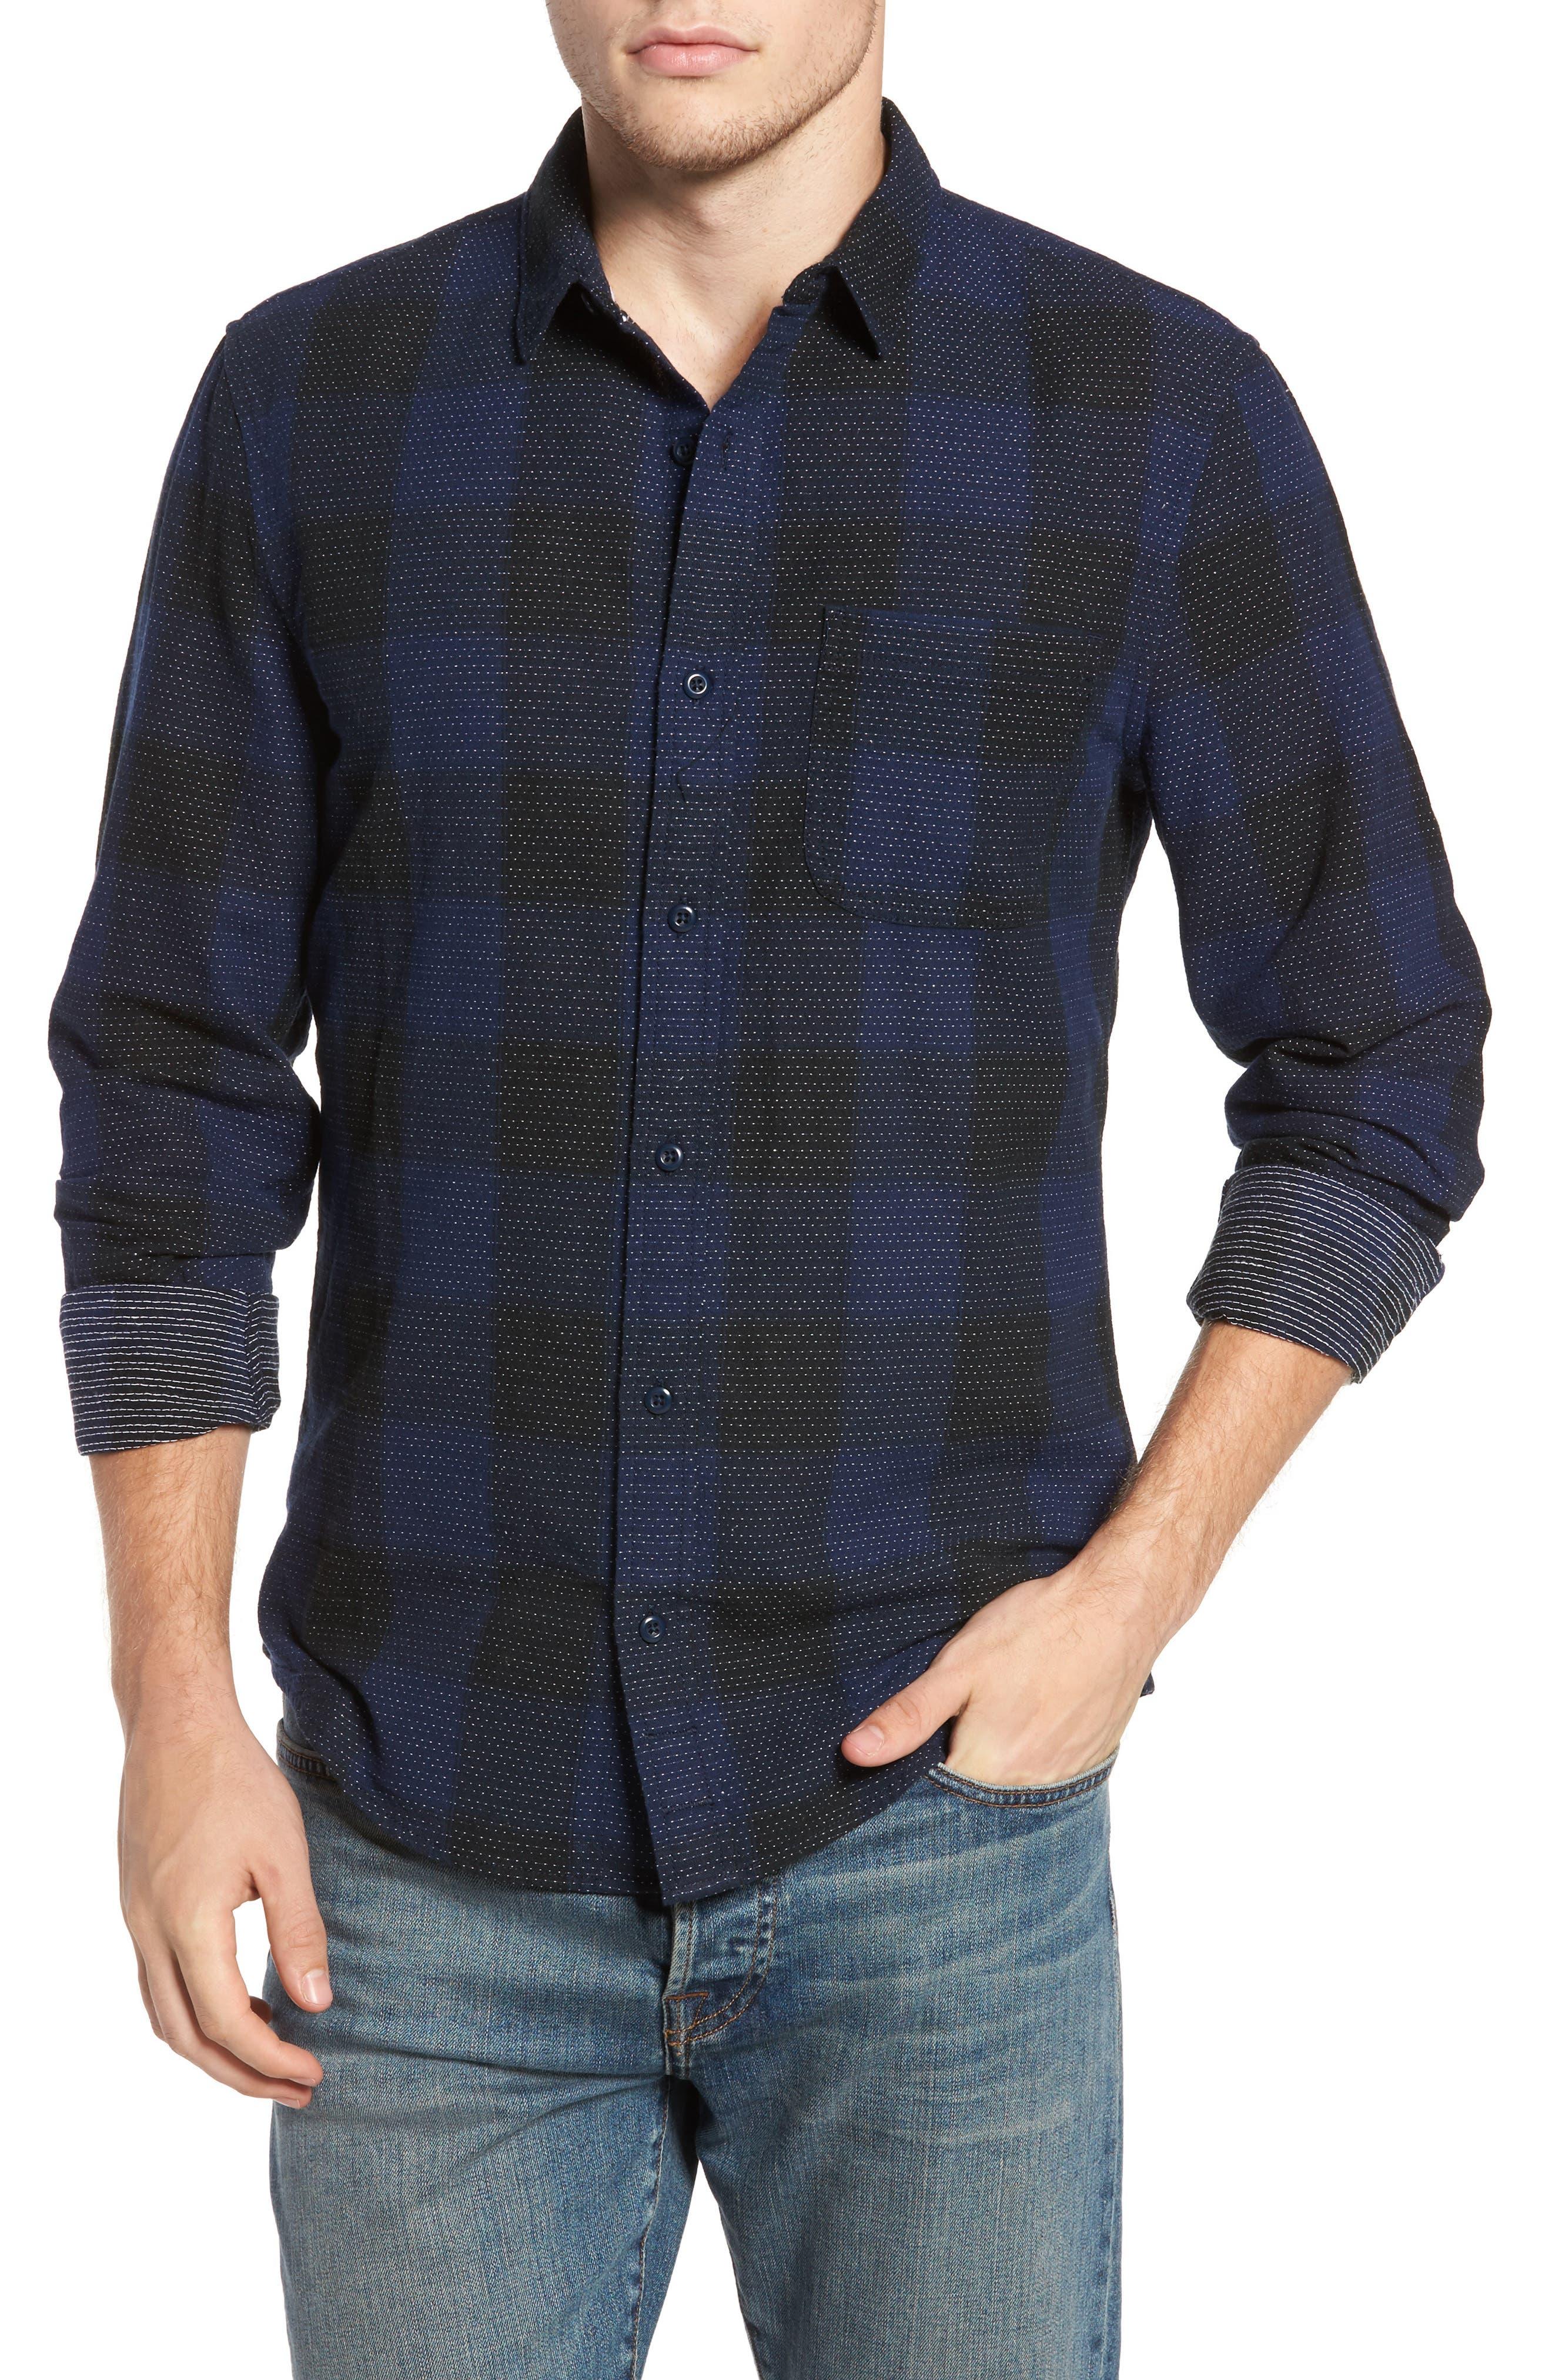 Dot Buffalo Plaid Shirt,                         Main,                         color, Black Rock- Blue Buffalo Plaid